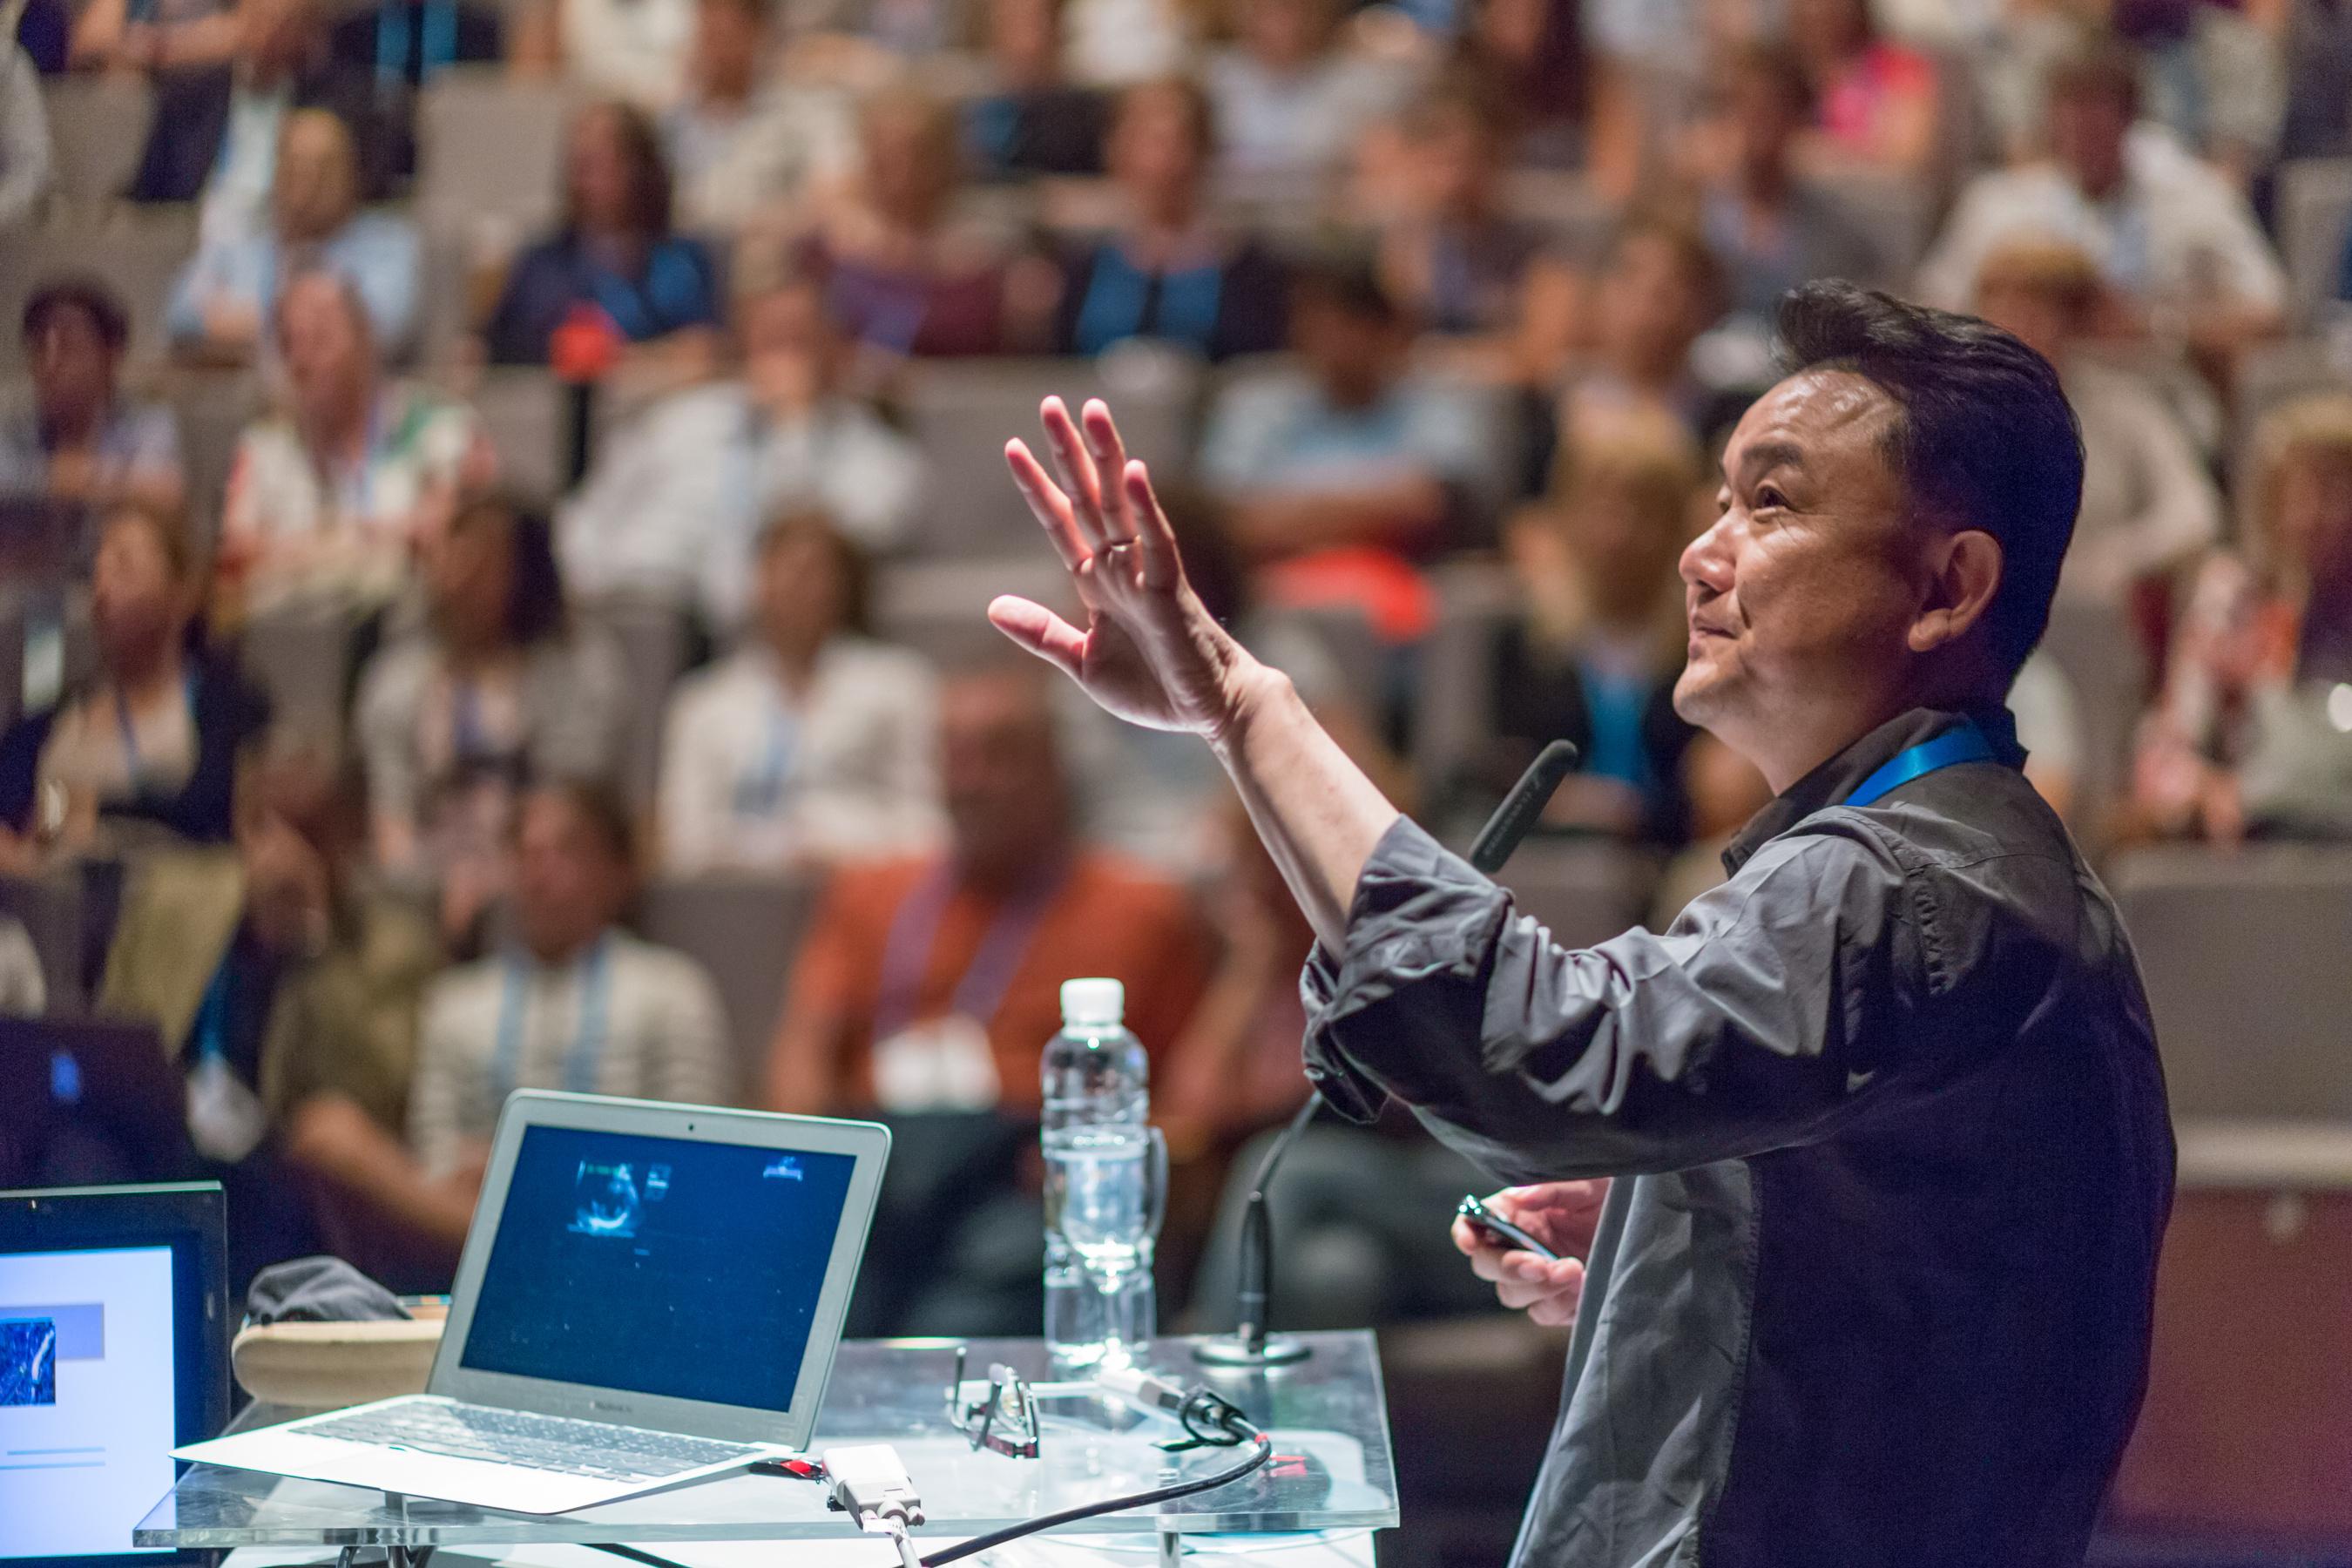 Microsoft Vietnam: 2018 Events